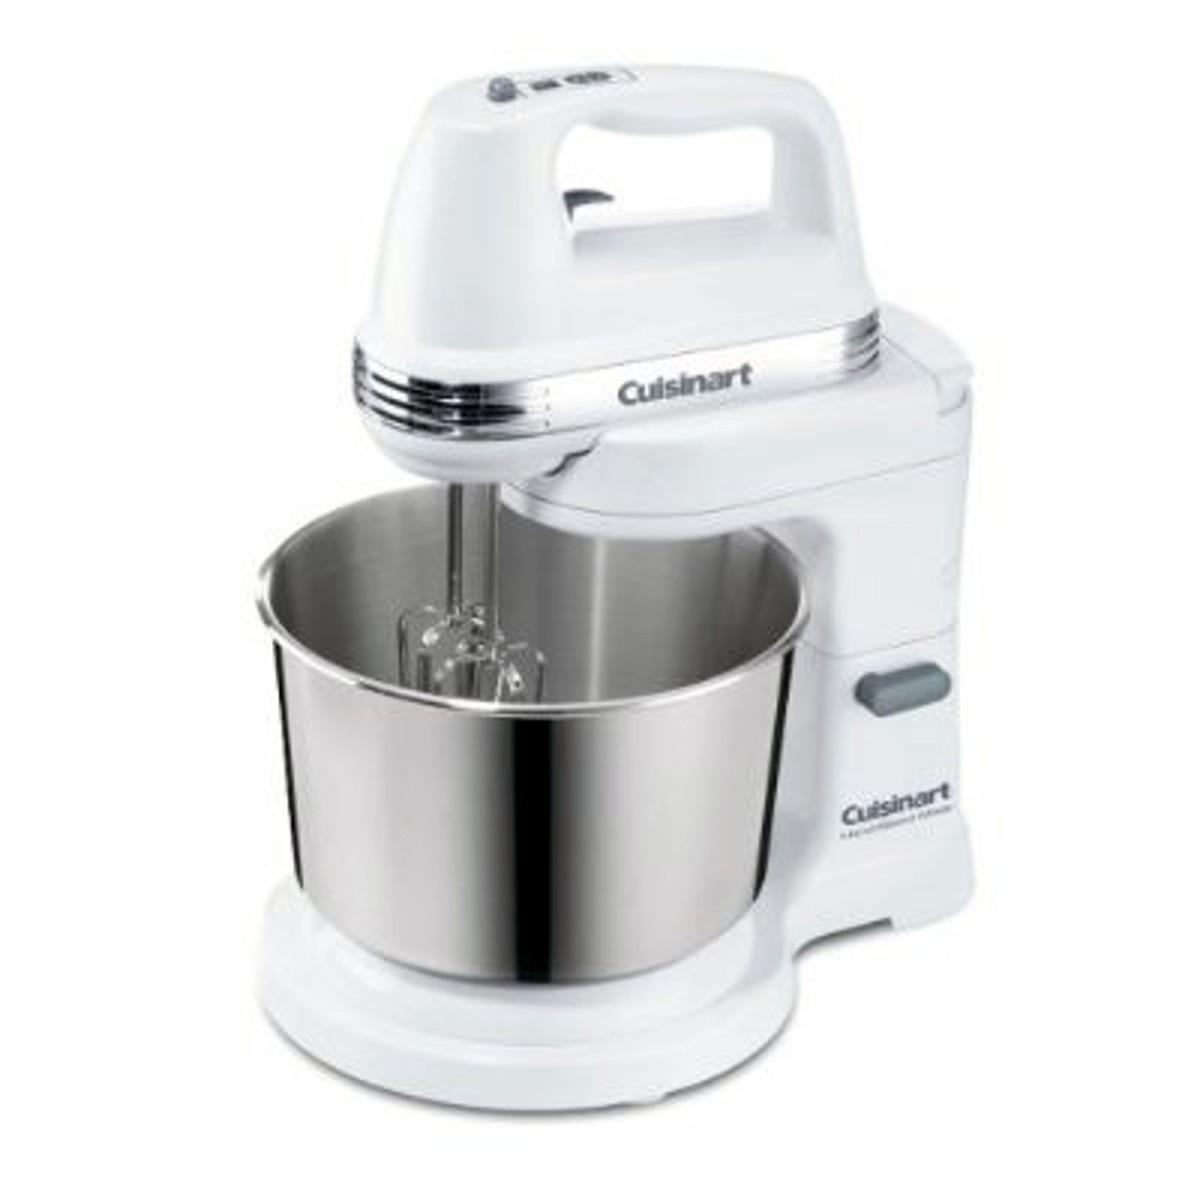 Cuisinart Hsm 70 Power Advantage Stand Mixer Review